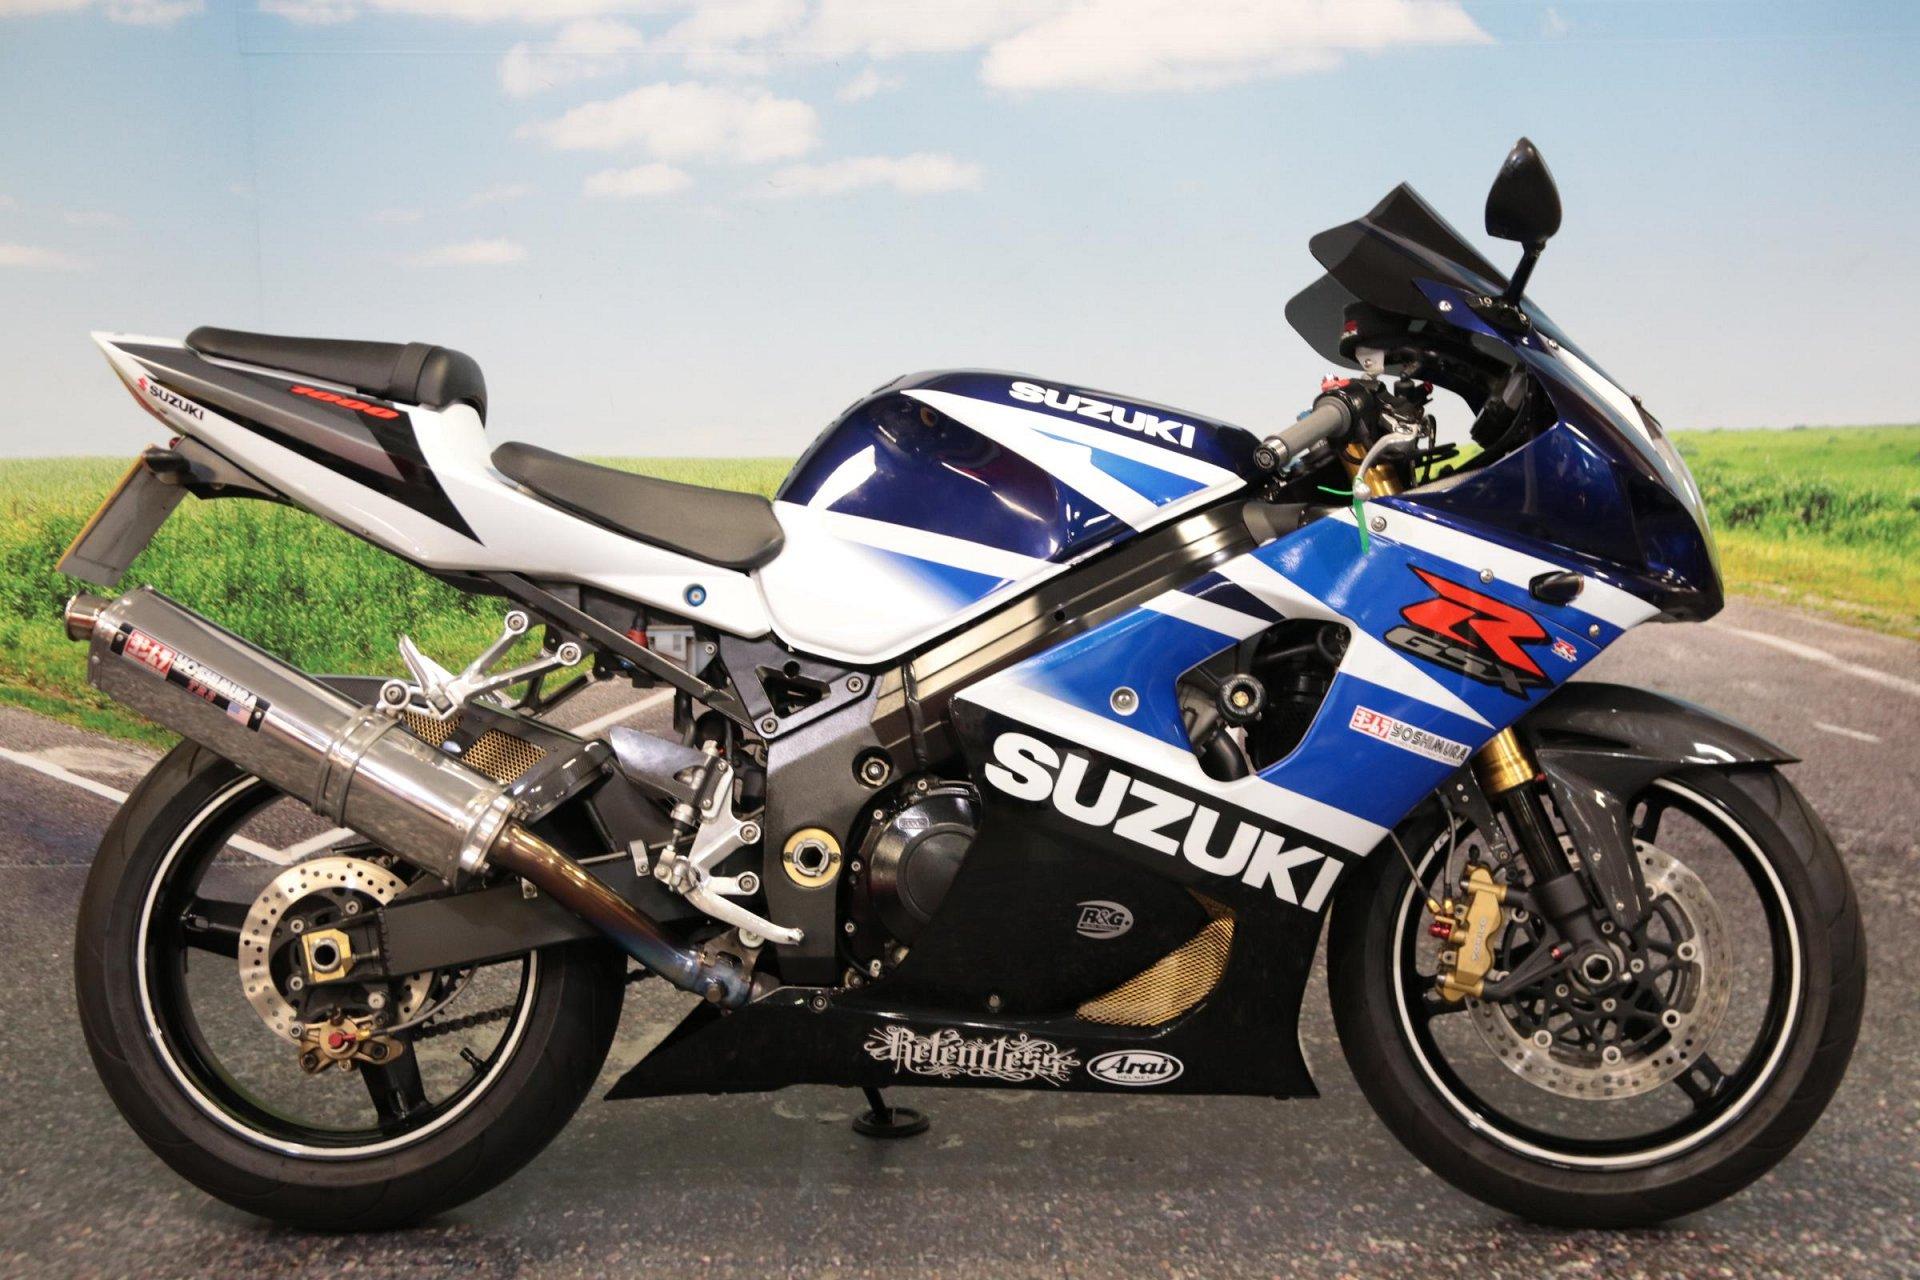 2003 Suzuki GSXR1000 for sale in South Wales